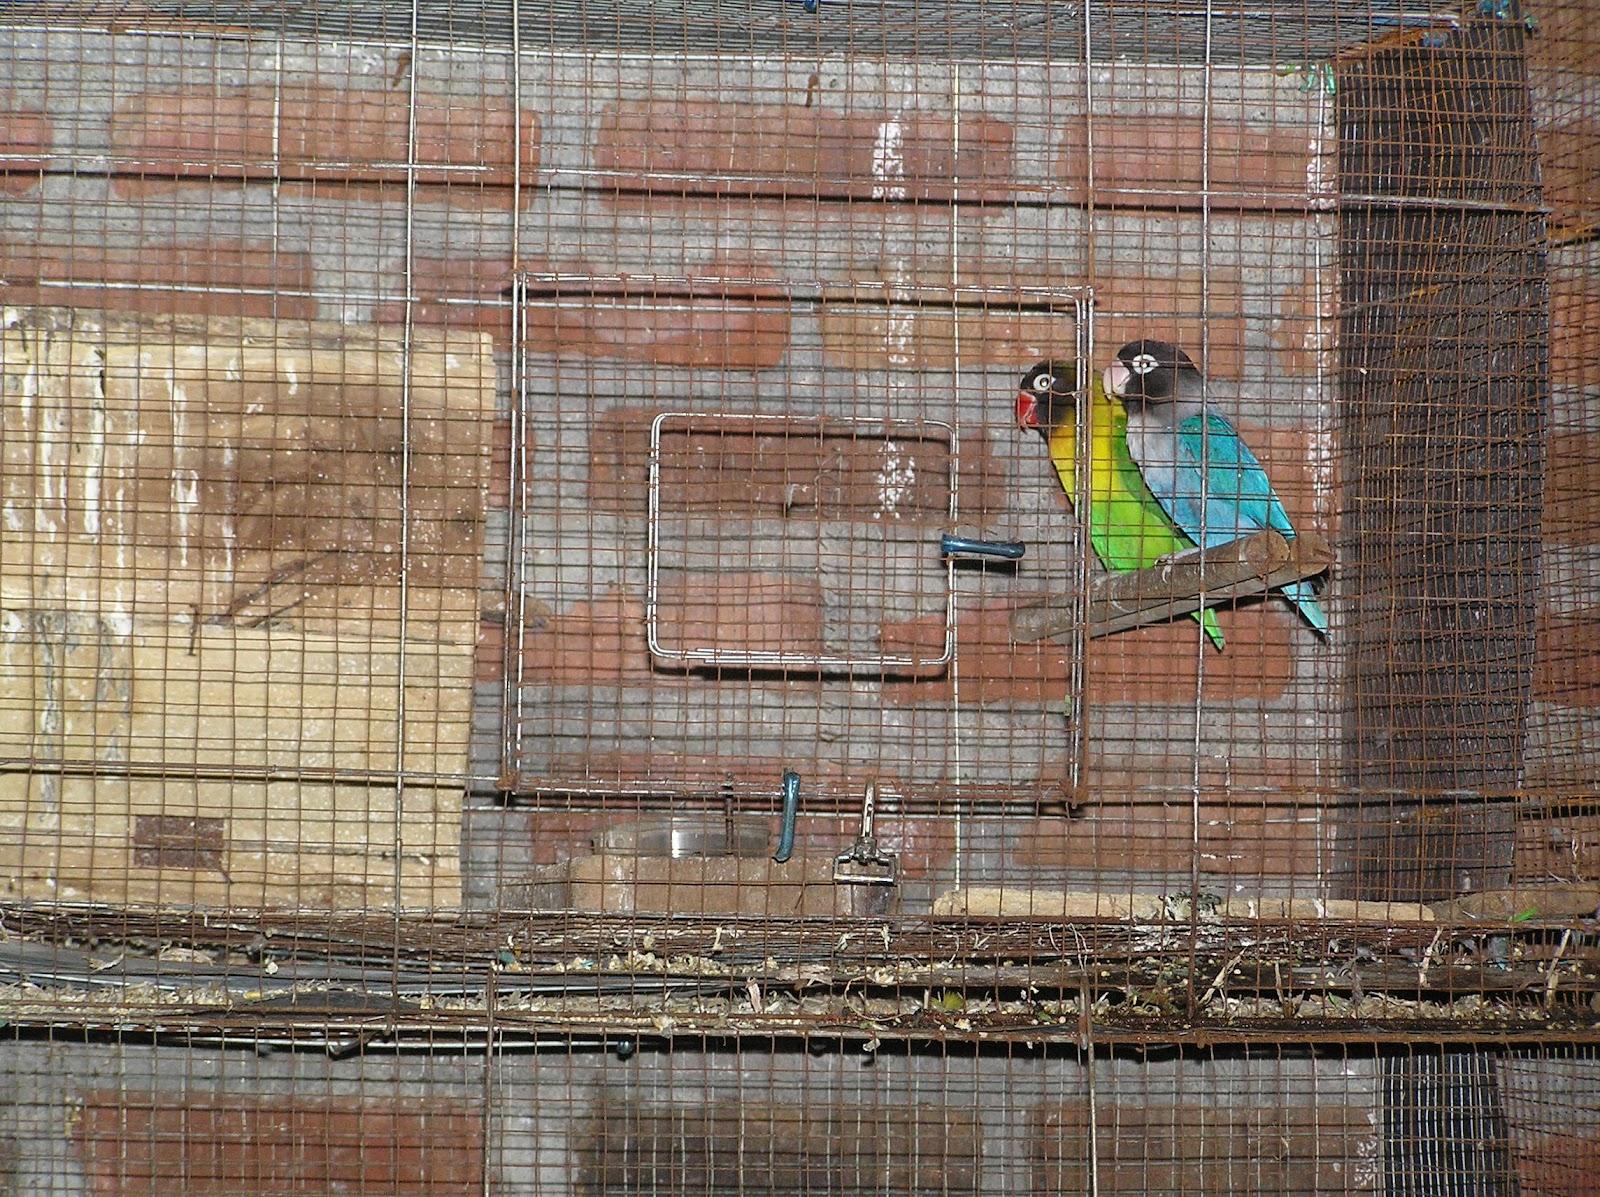 komunitas kicau mania surabaya utara ternak love bird